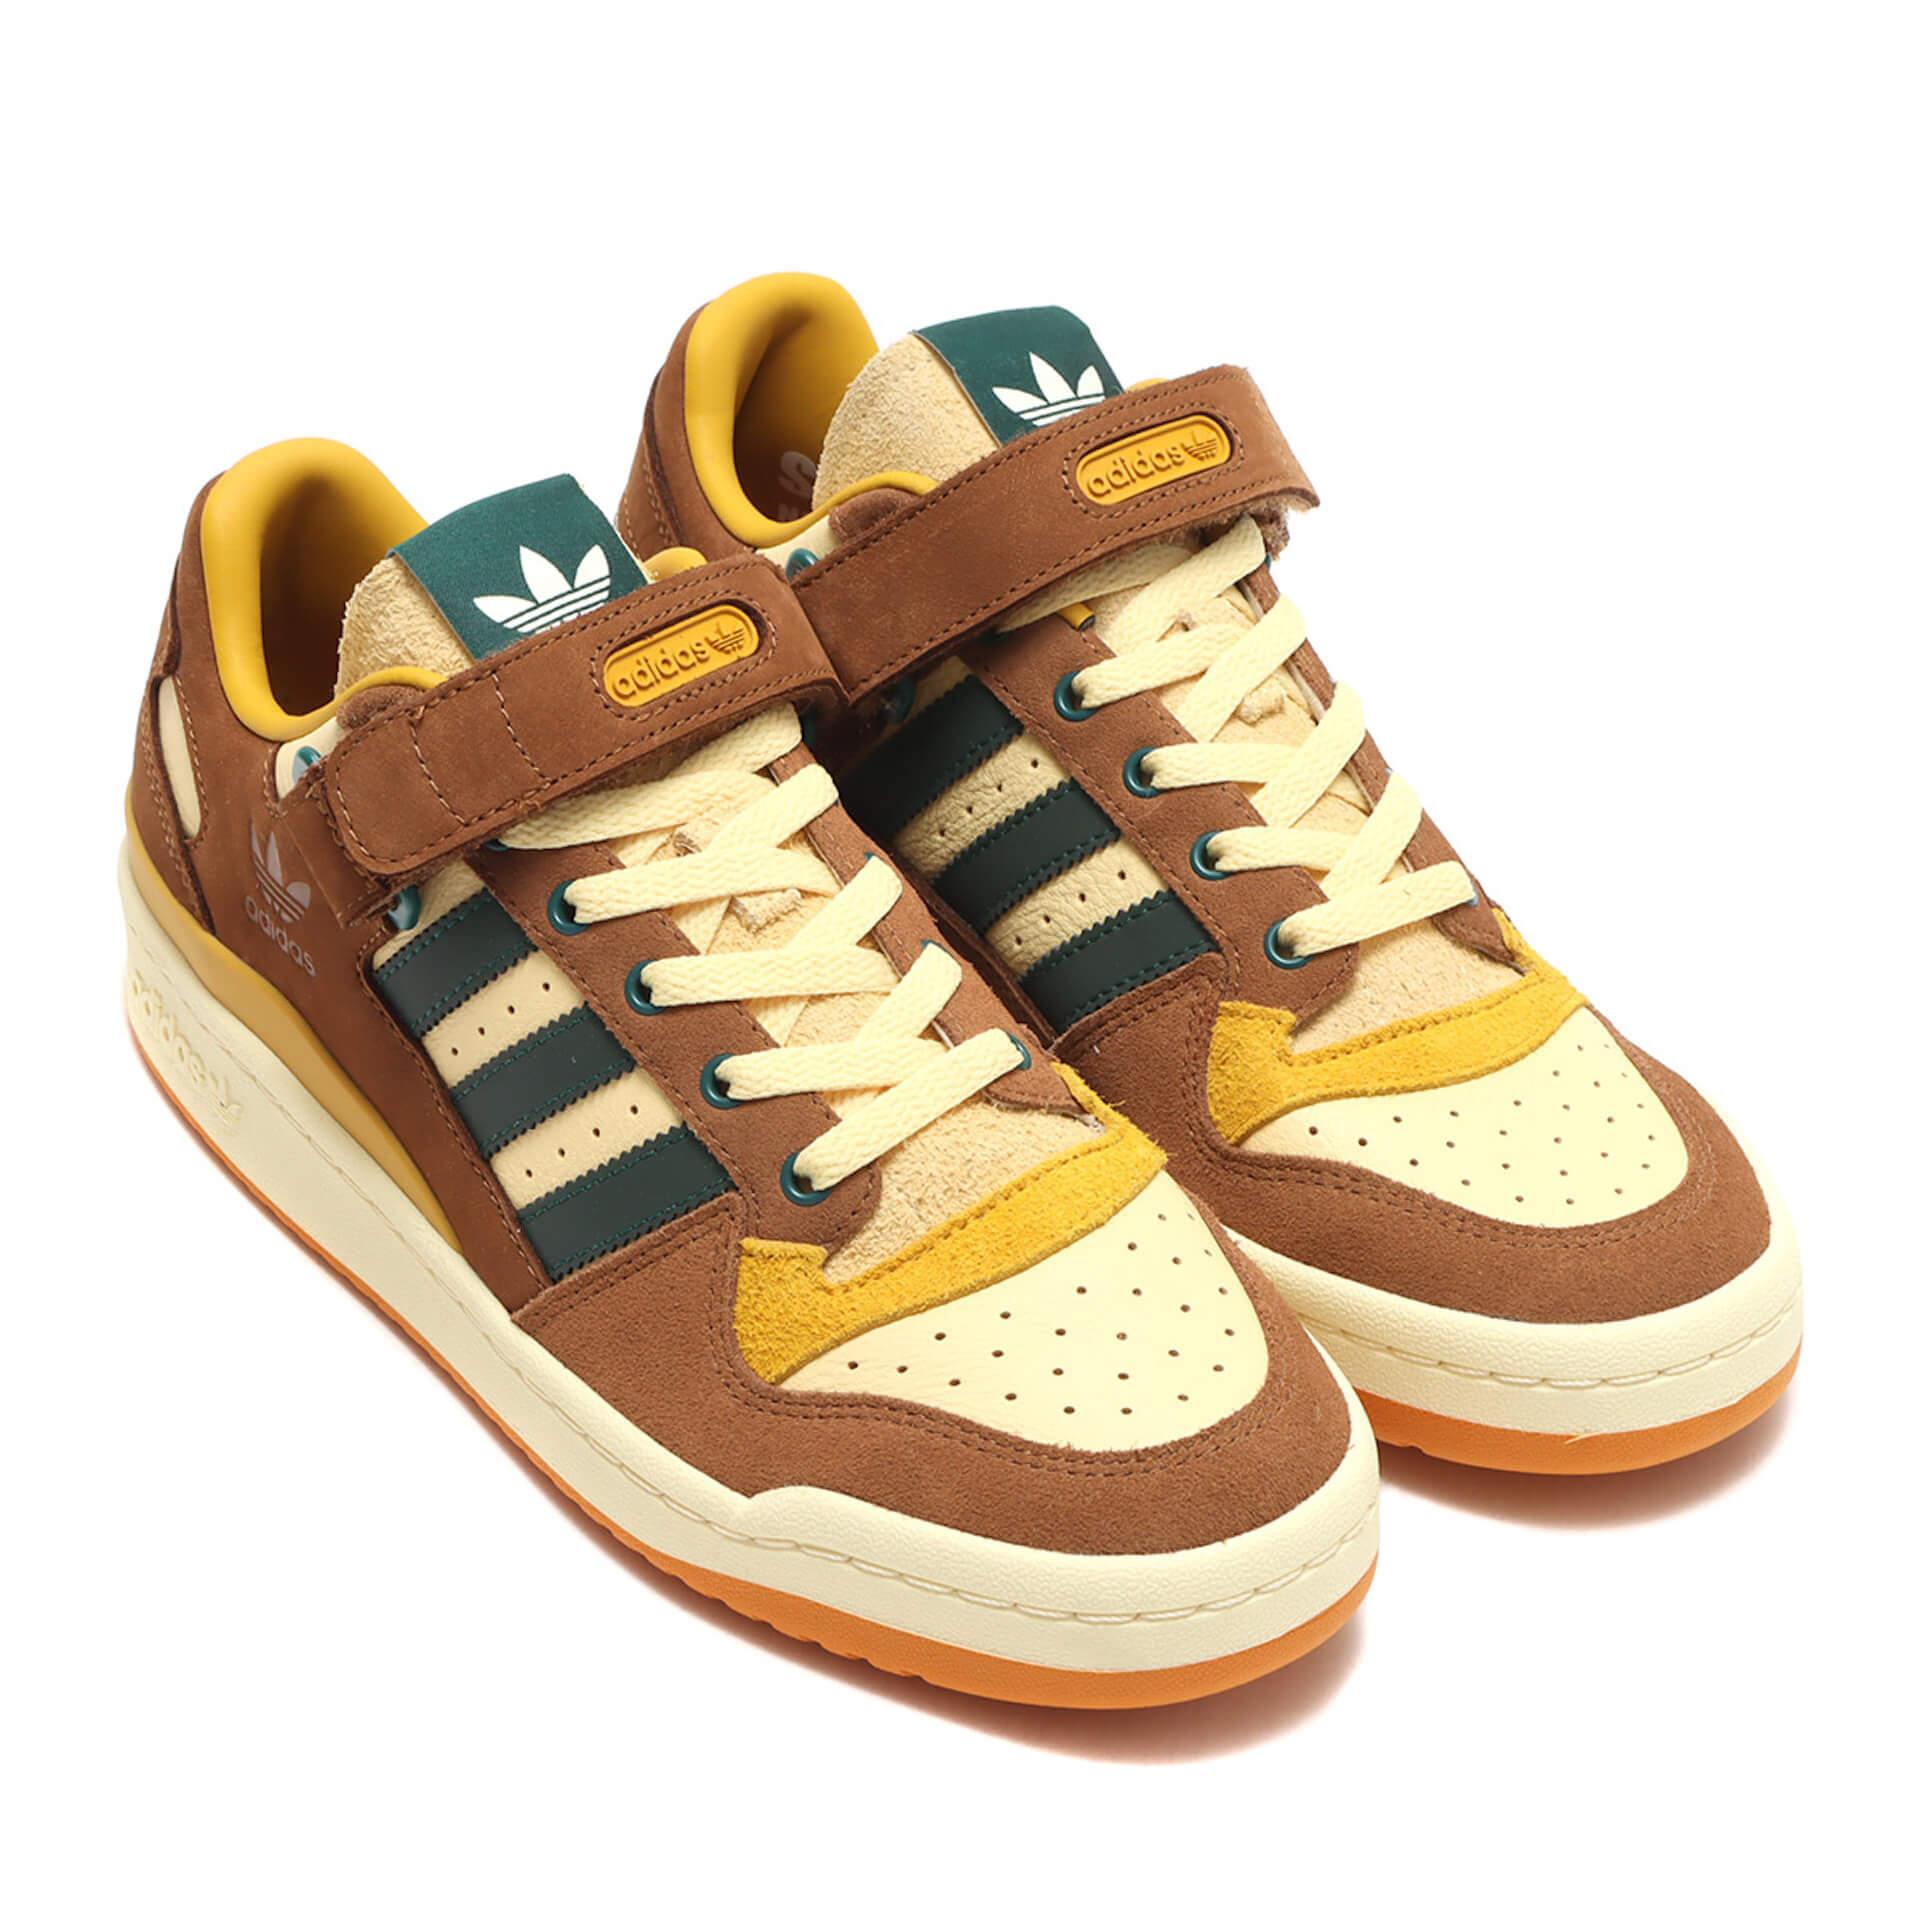 "adidas Originalsとatmosのコラボパック「""YOYOGI PARK"" PACK」が登場!代々木公園をモチーフにしたZX 8000、FORUMの2足が発売 life210802_adidasoriginals_yoyogipark_10"